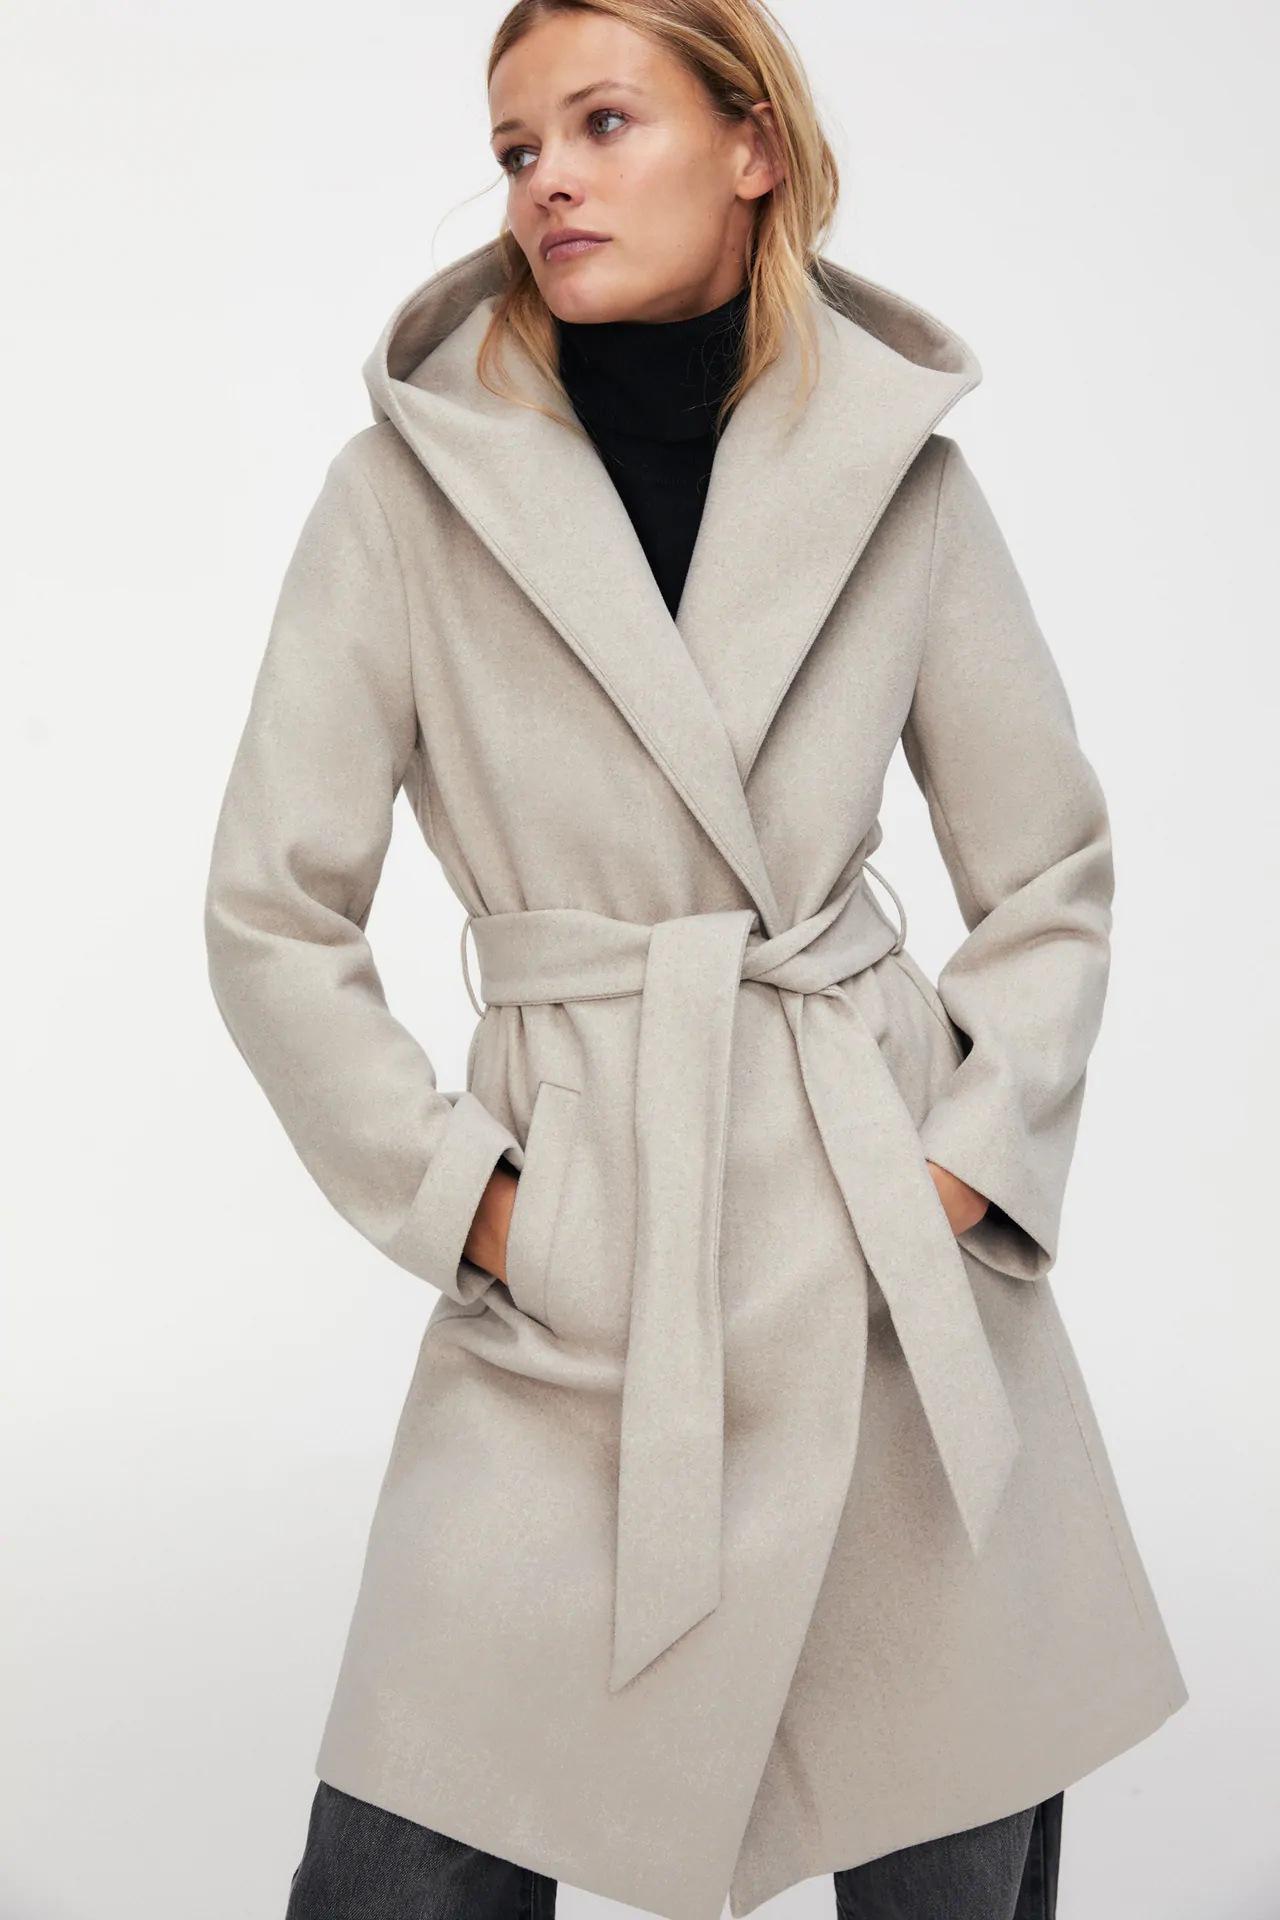 wholesale autumn A hooded women's woolen coat jacket  NSAM3241